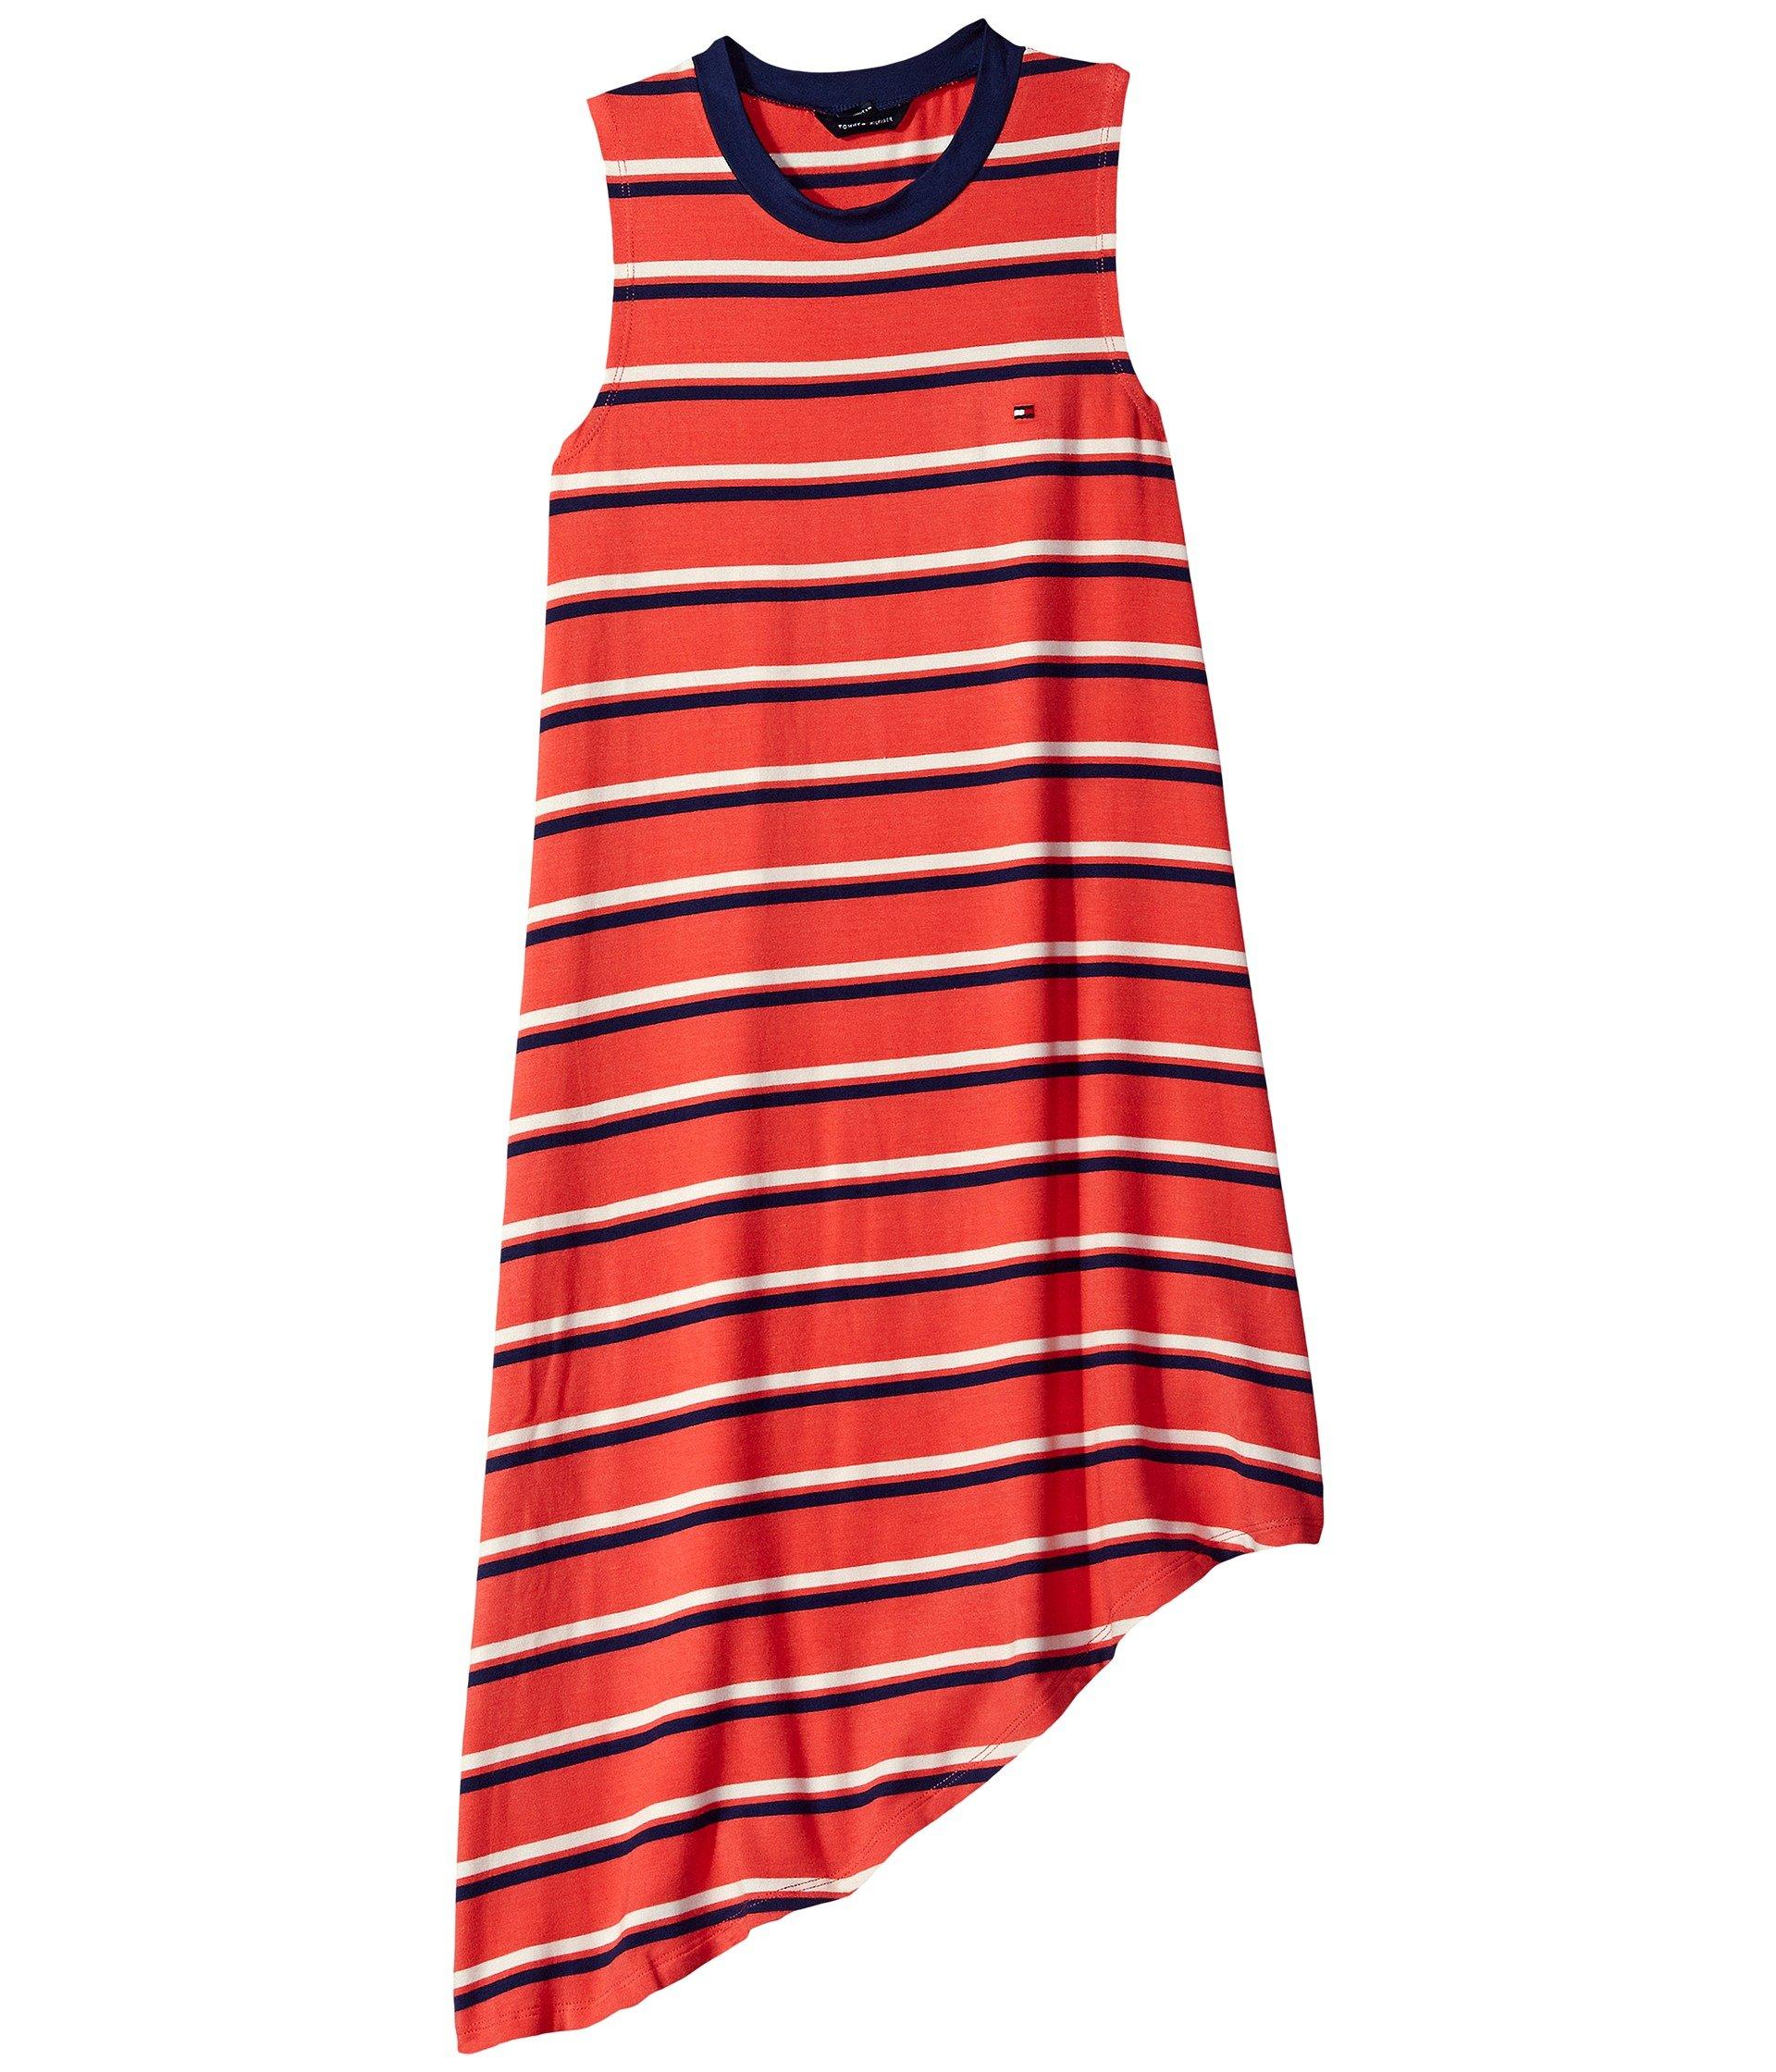 Vestido para Niña Tommy Hilfiger Kids Yarn-Dye Asymmetrical Dress (Big Kids)  + Tommy Hilfiger en VeoyCompro.net